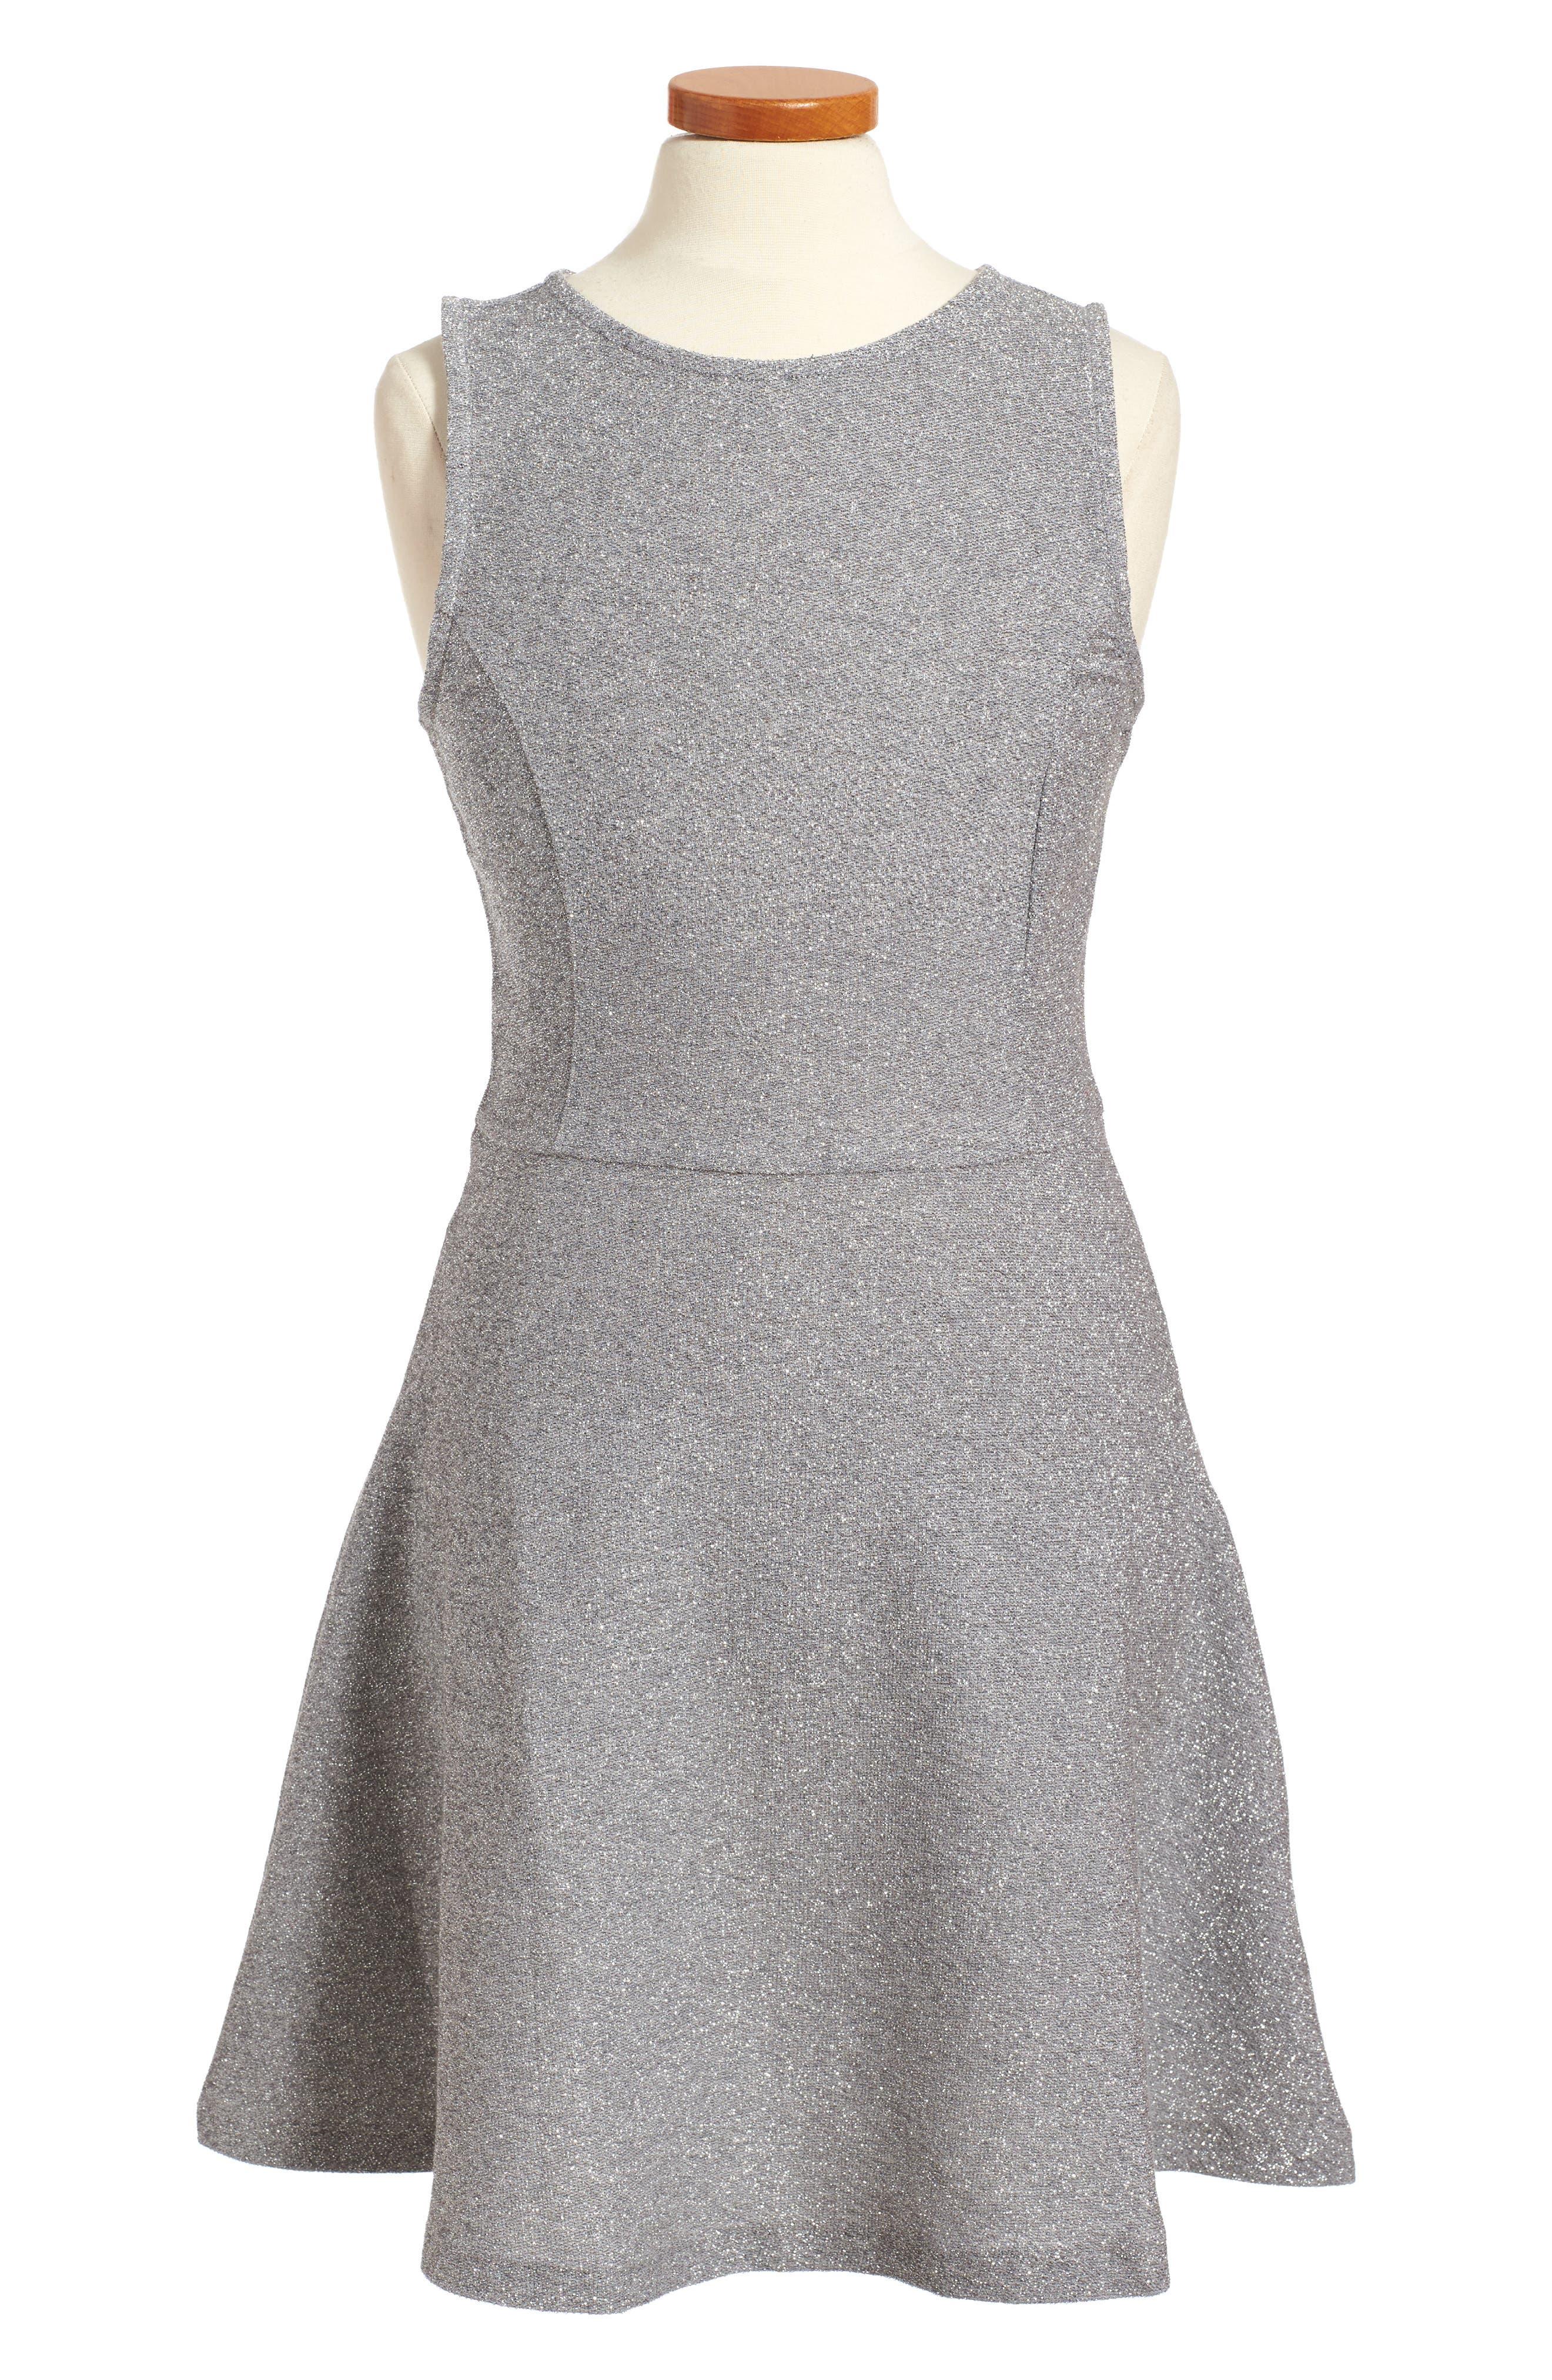 Sparkle Skater Dress,                         Main,                         color, Silver